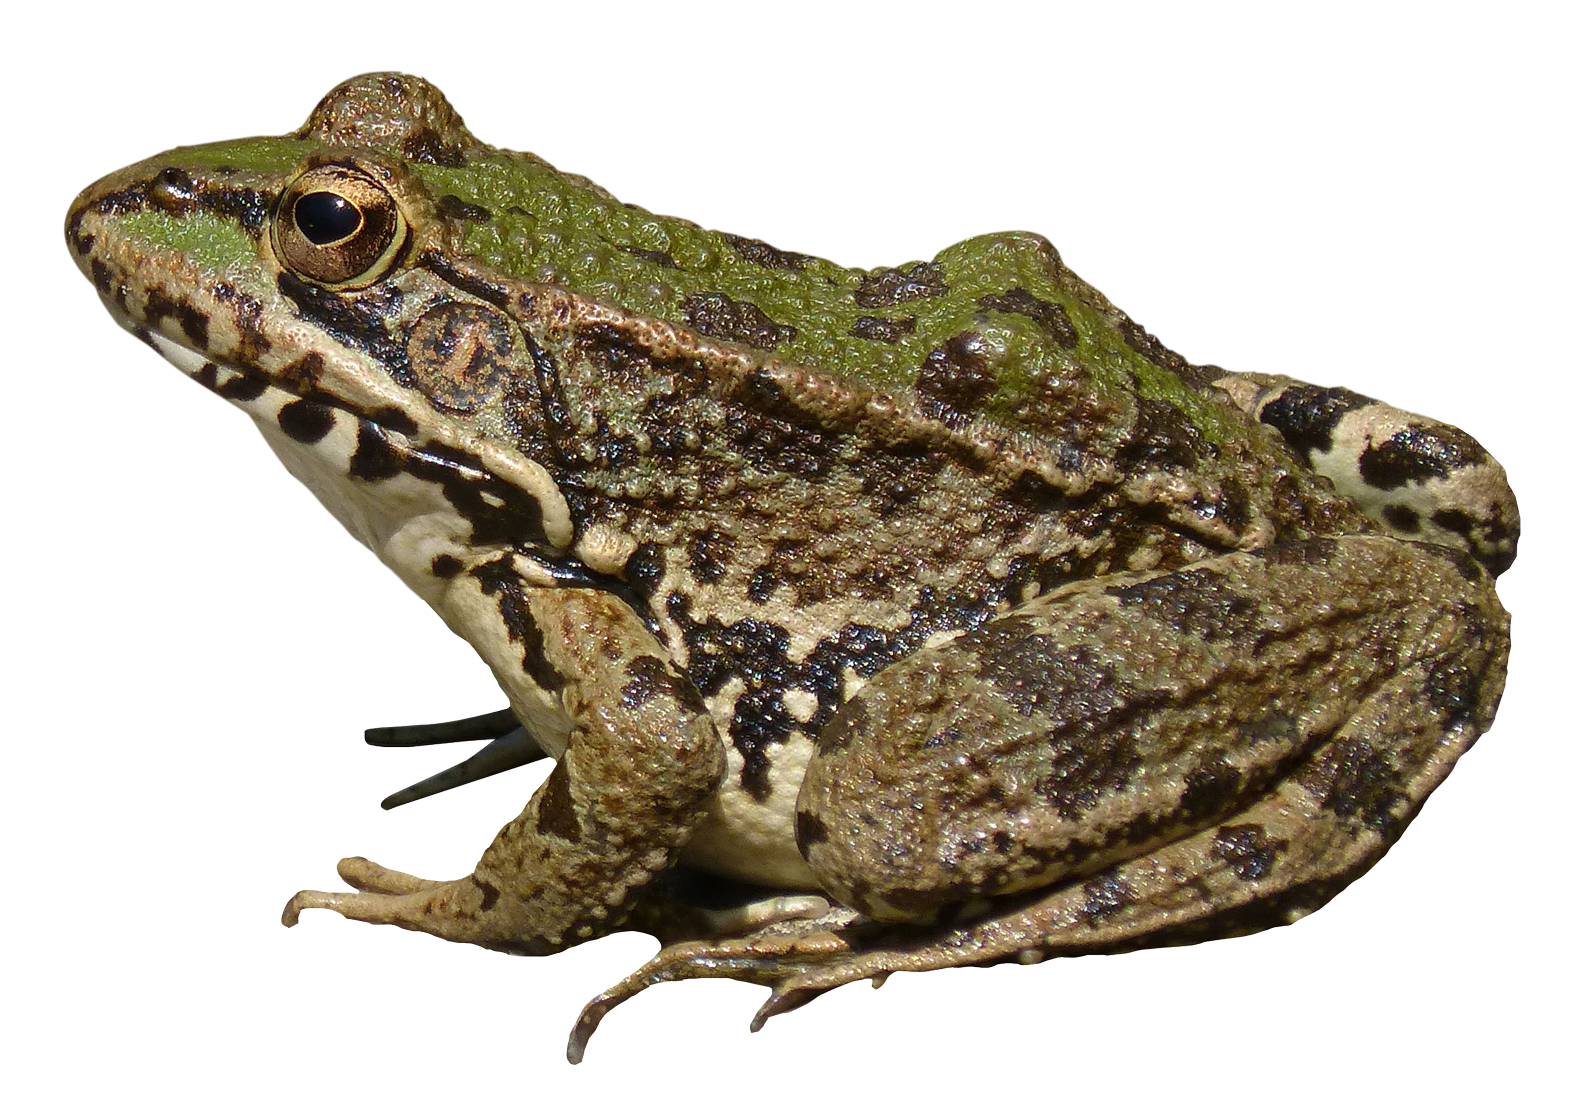 Amazing Frog PNG Image